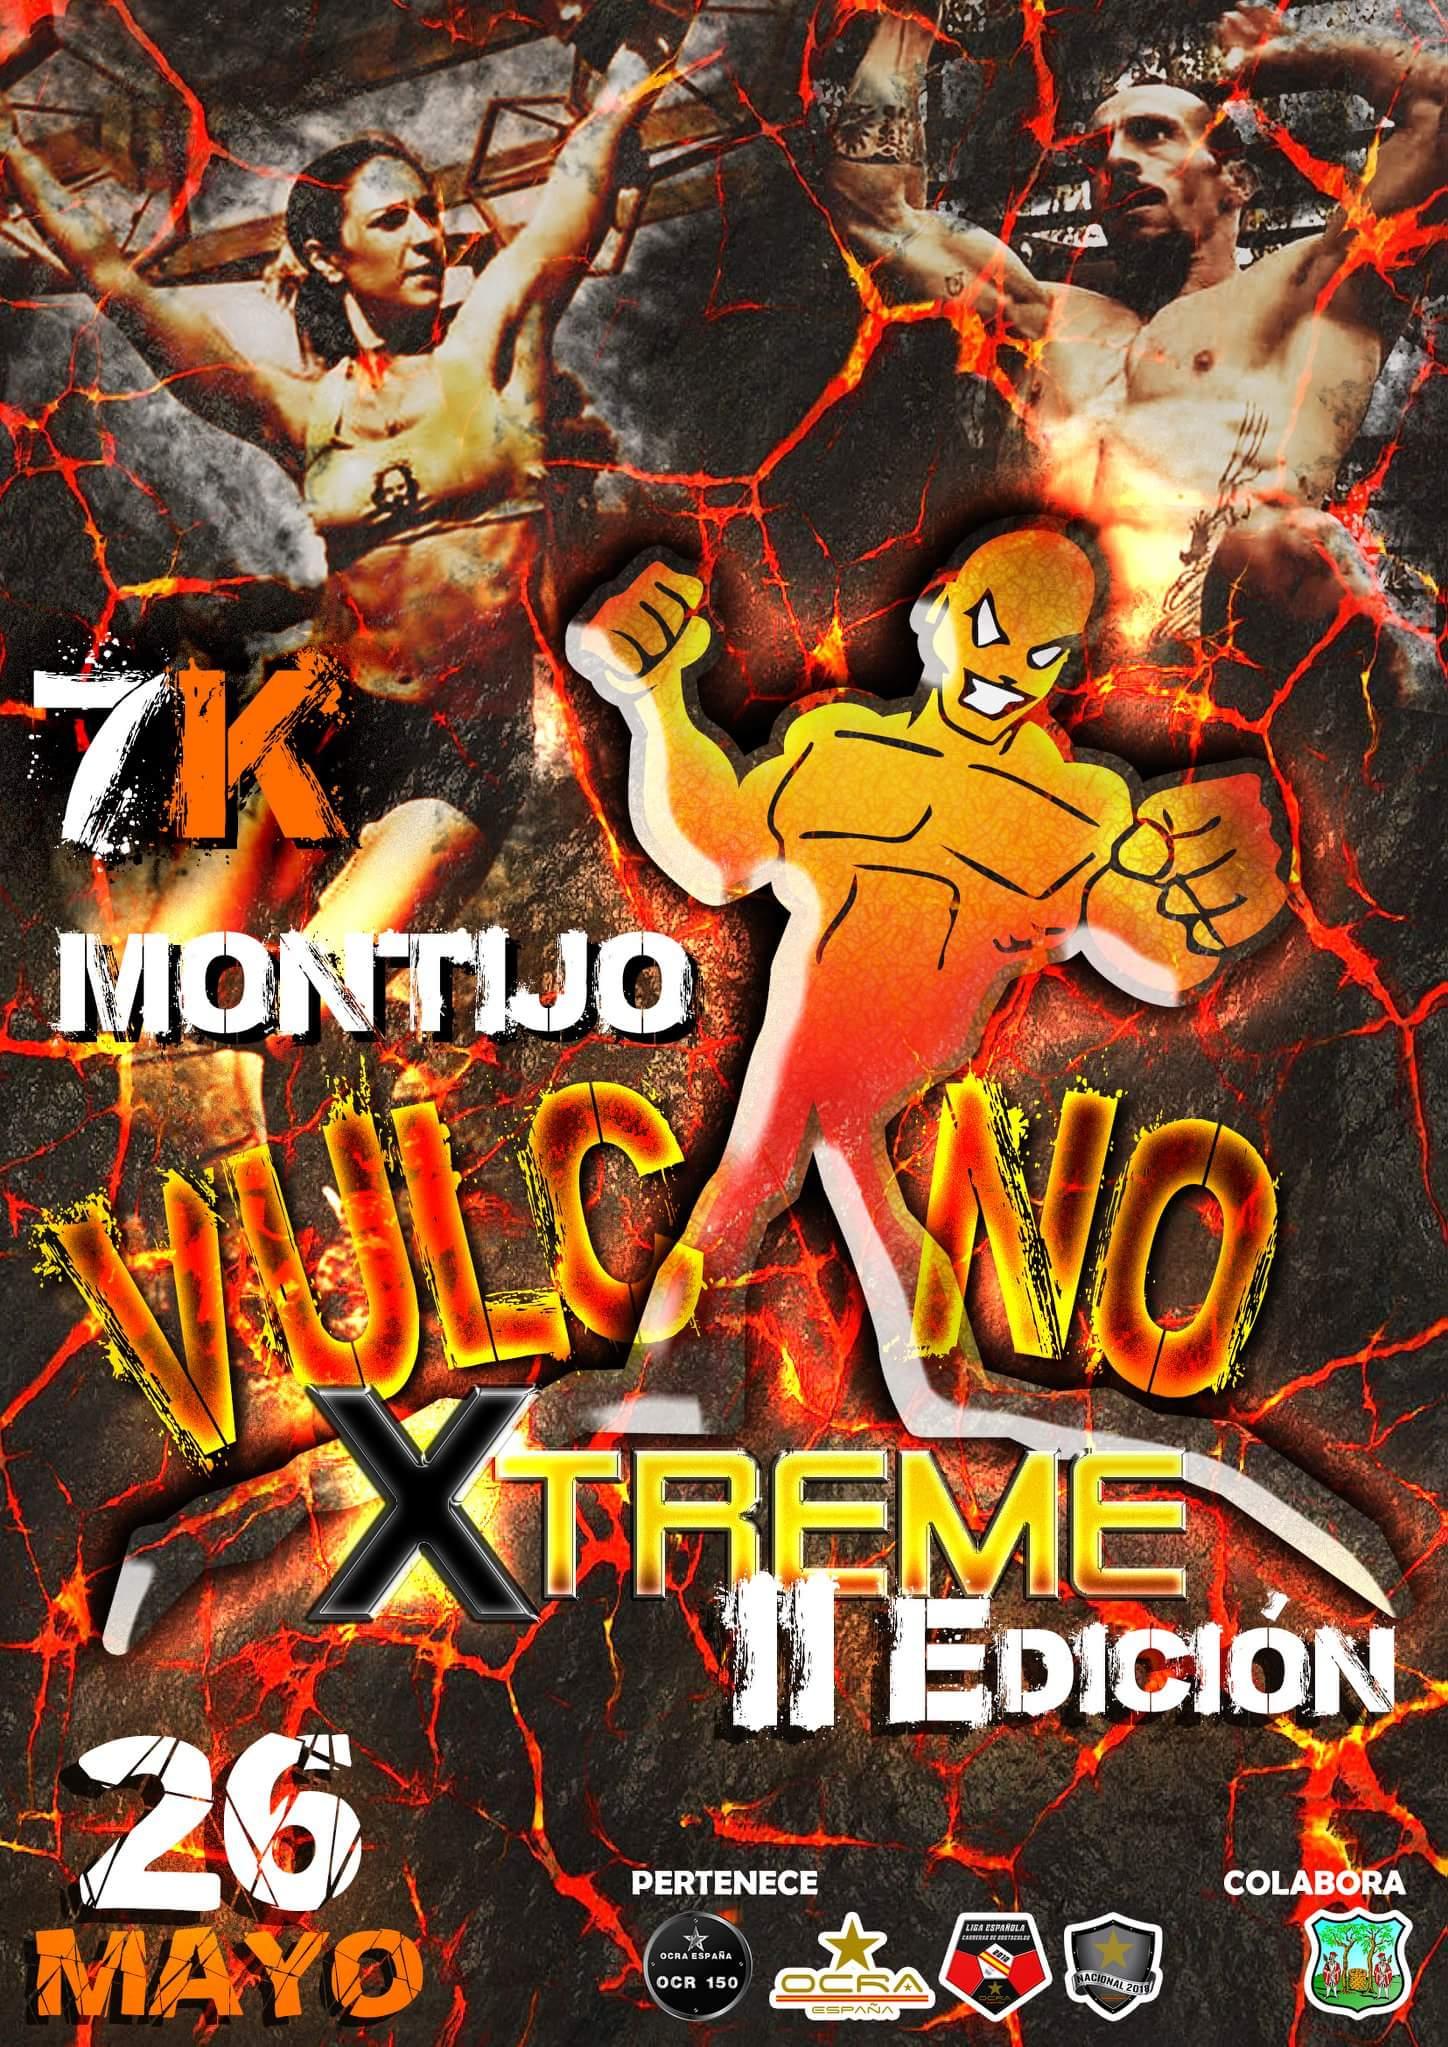 Vulcano Xtreme 2018 COMPETITIVE